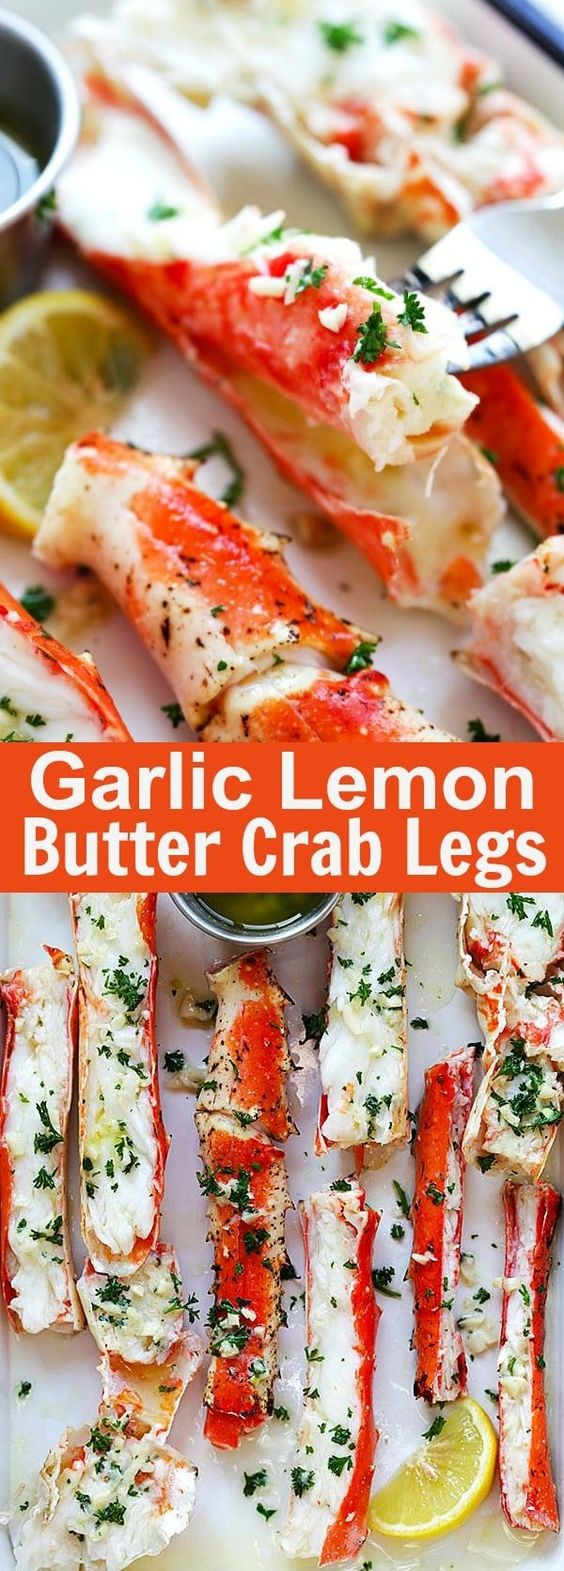 Amazing Garlic Lemon Butter Crab Legs